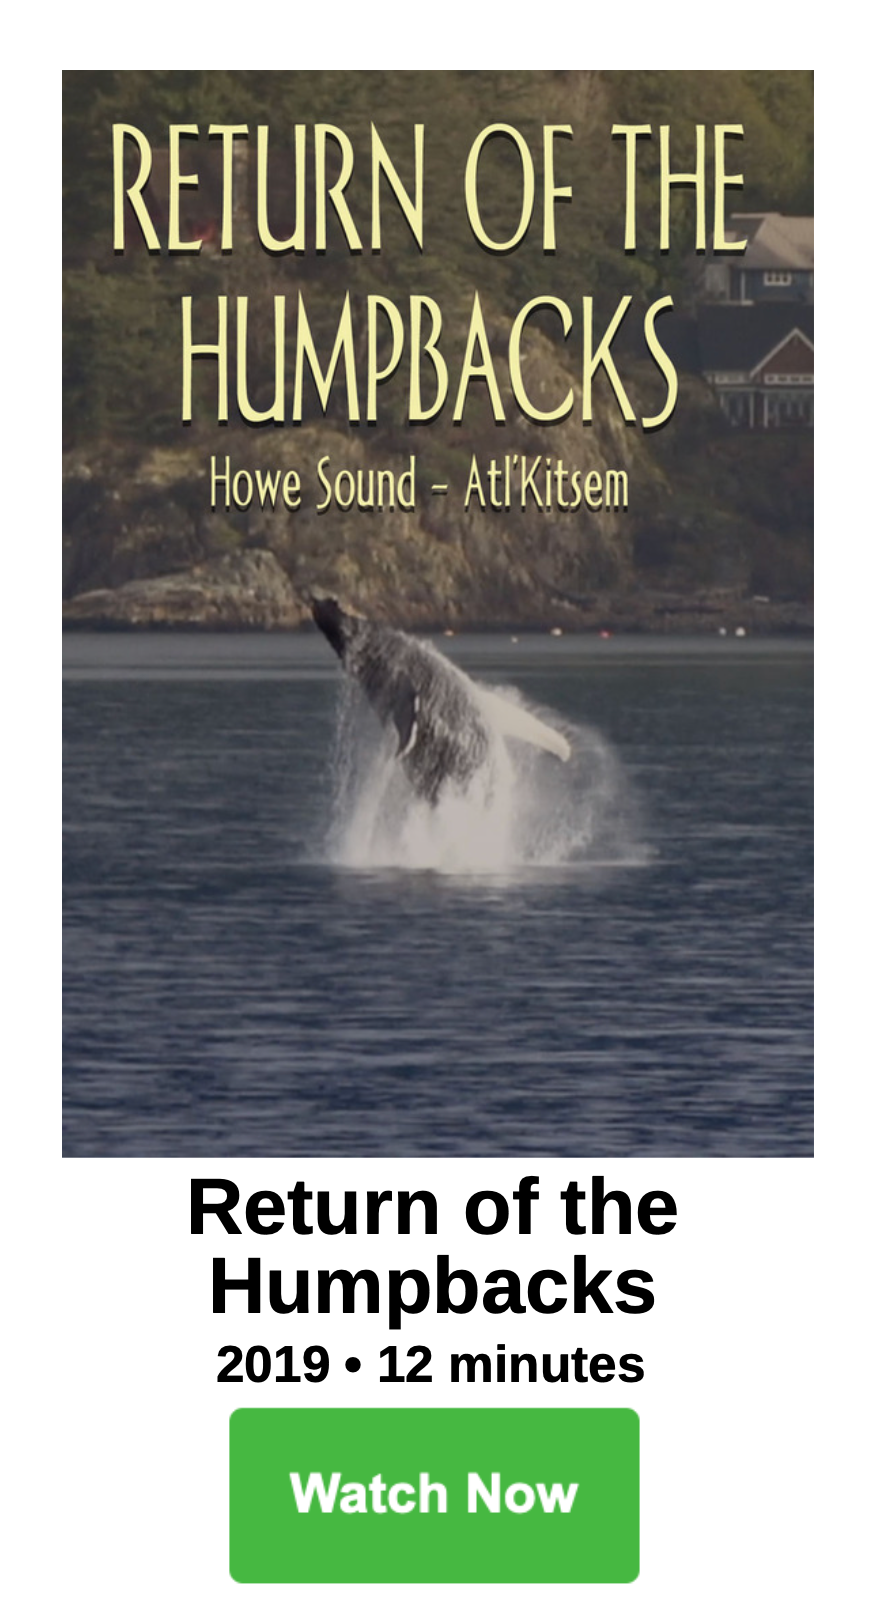 Return of the Humpbacks